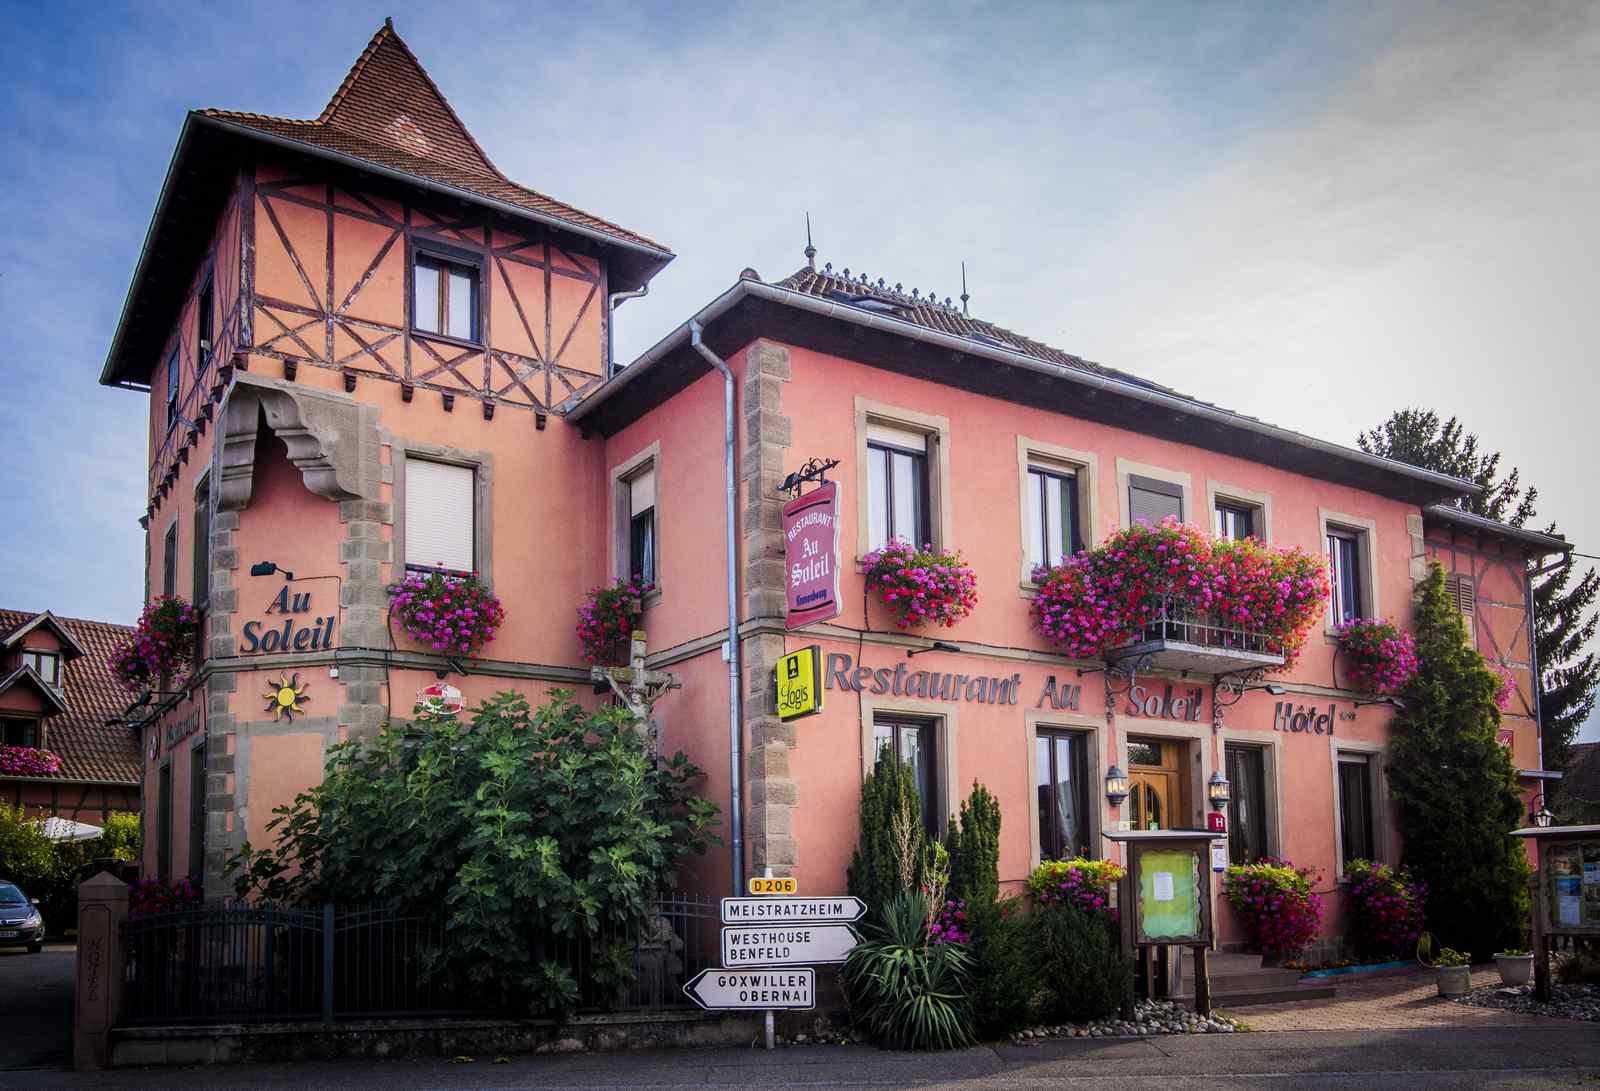 Hôtel & Spa-restaurant Au Soleil